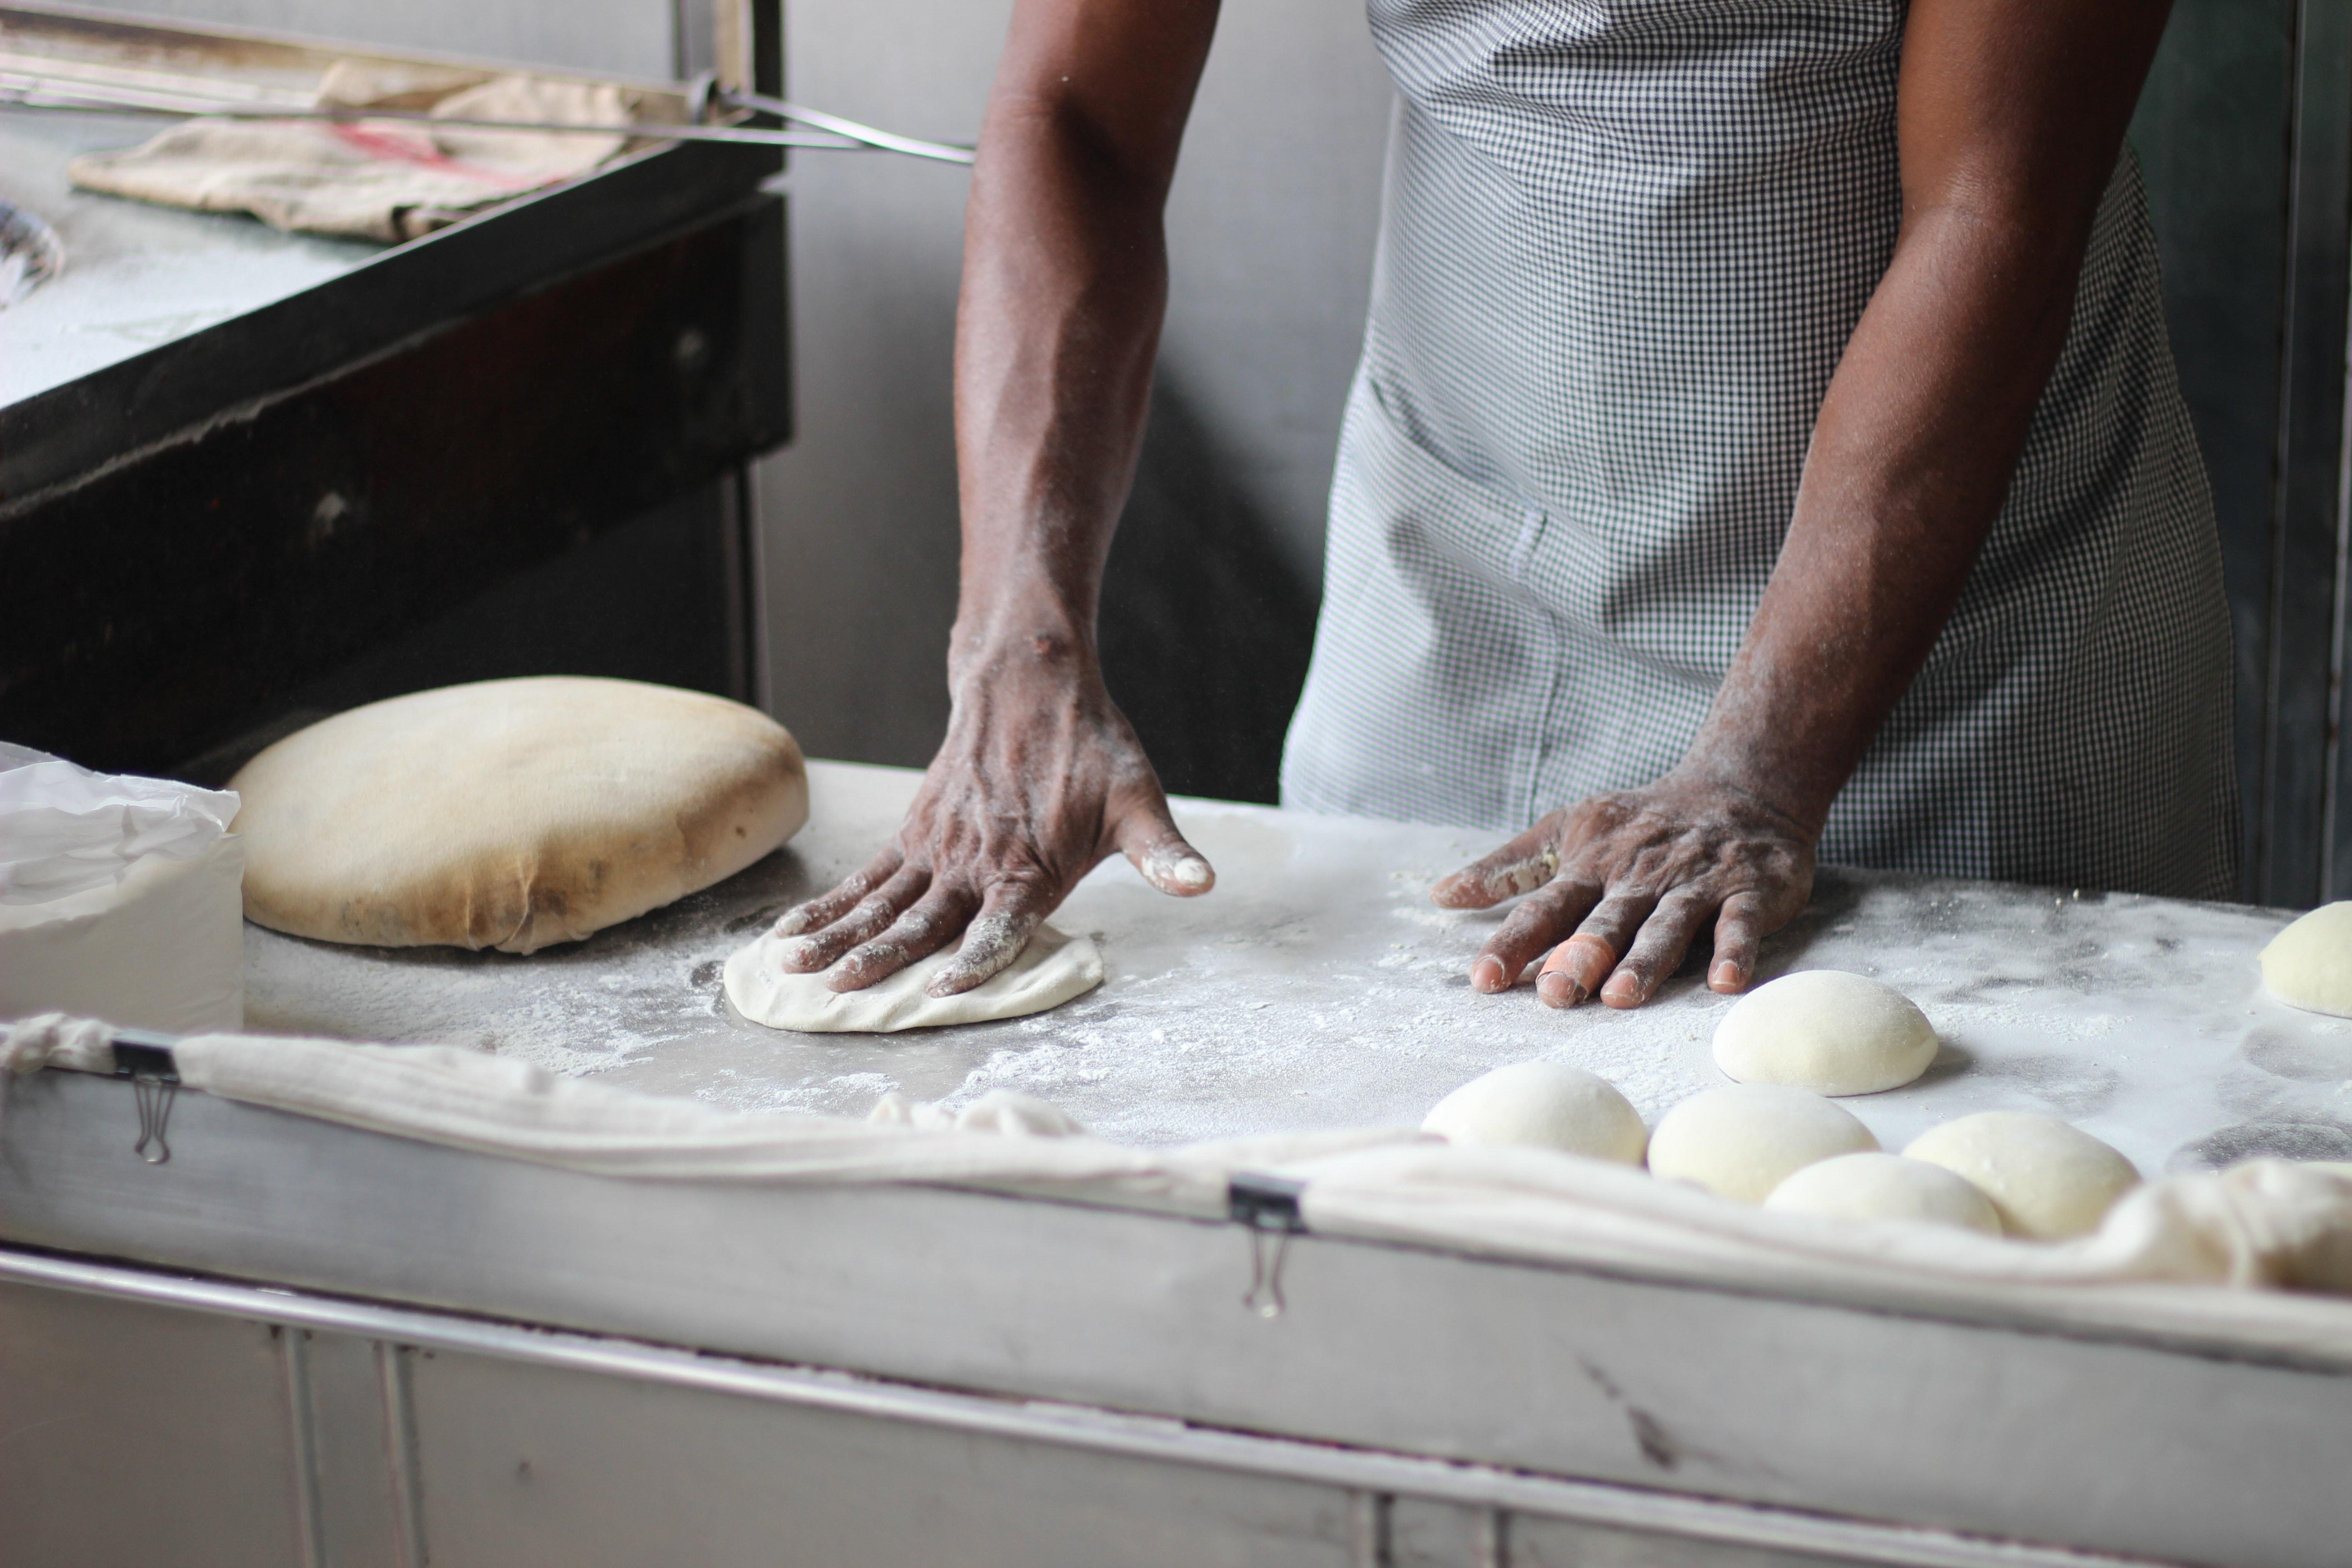 Restaurant preparing food